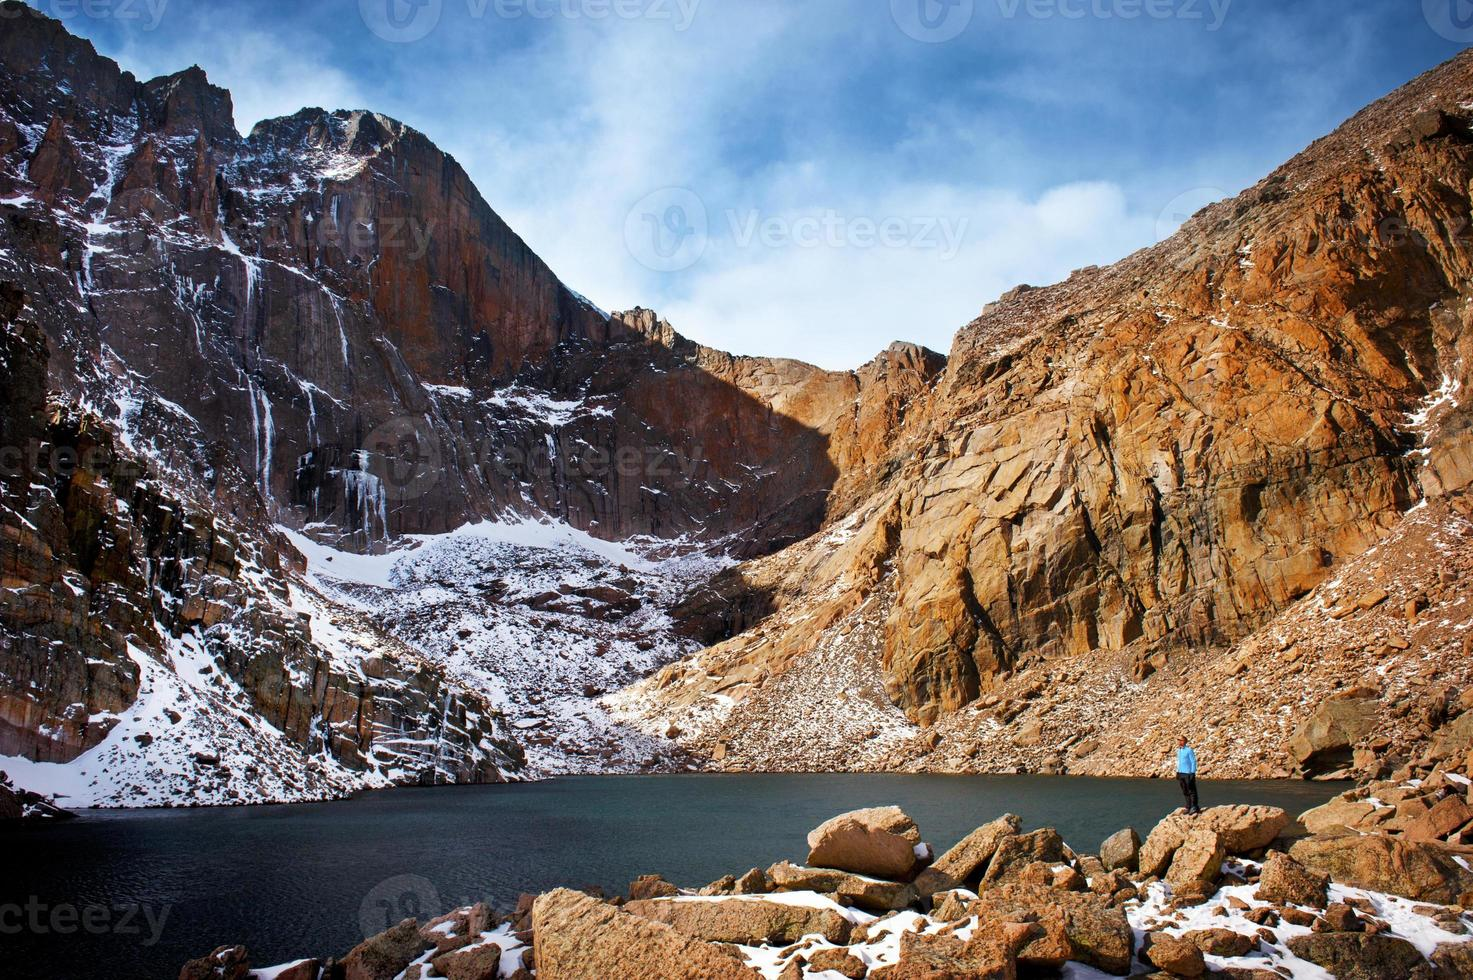 alpinista examina o abismo lago foto